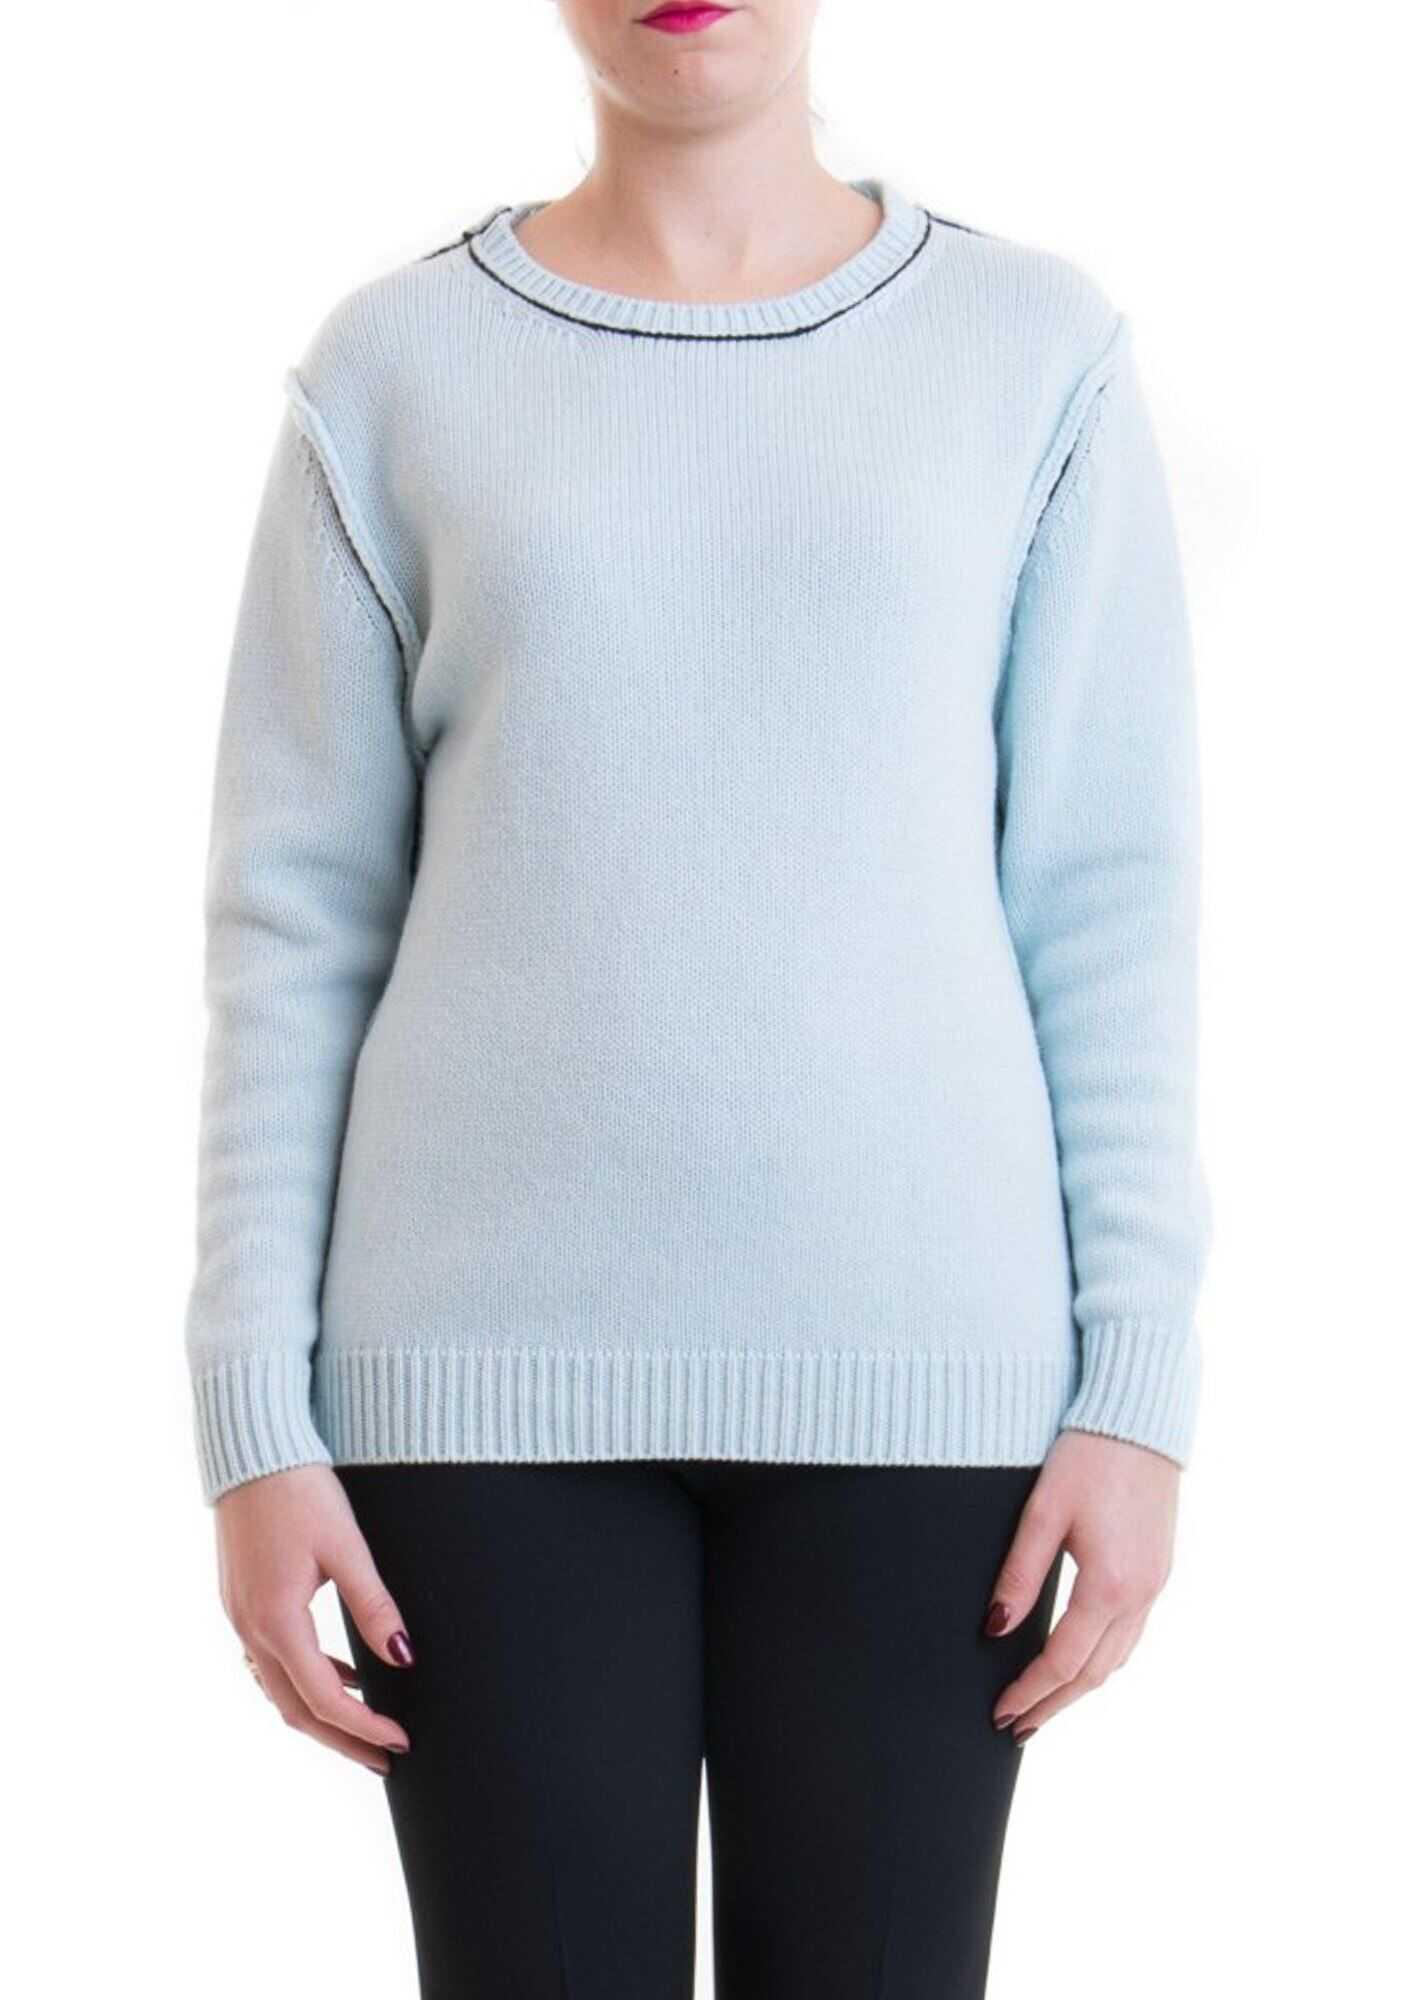 Blumarine Contrasting Piping Sweater Light Blue